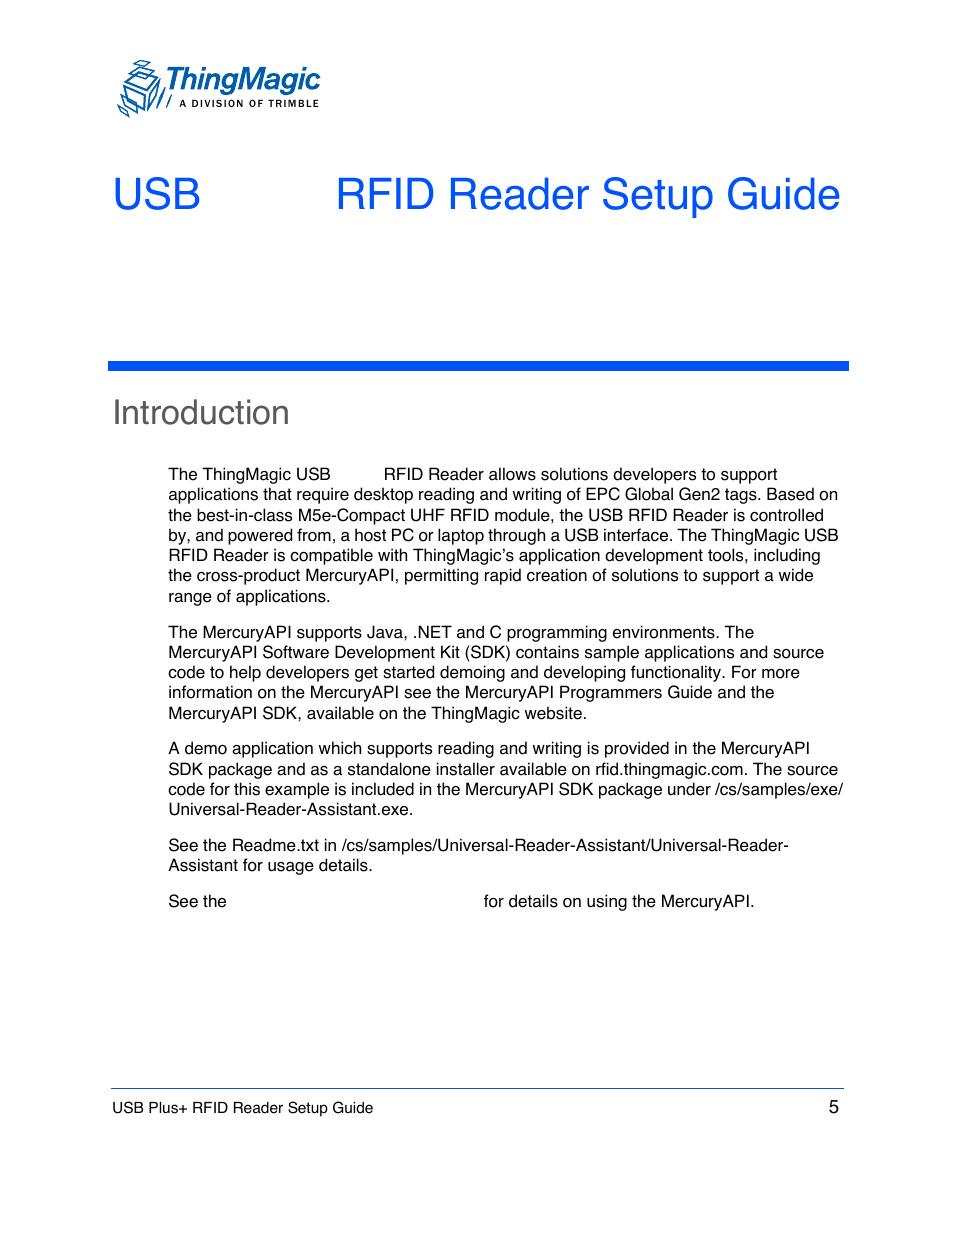 ThingMagic USB Plus+ RFID Reader User Manual | Page 5 / 16